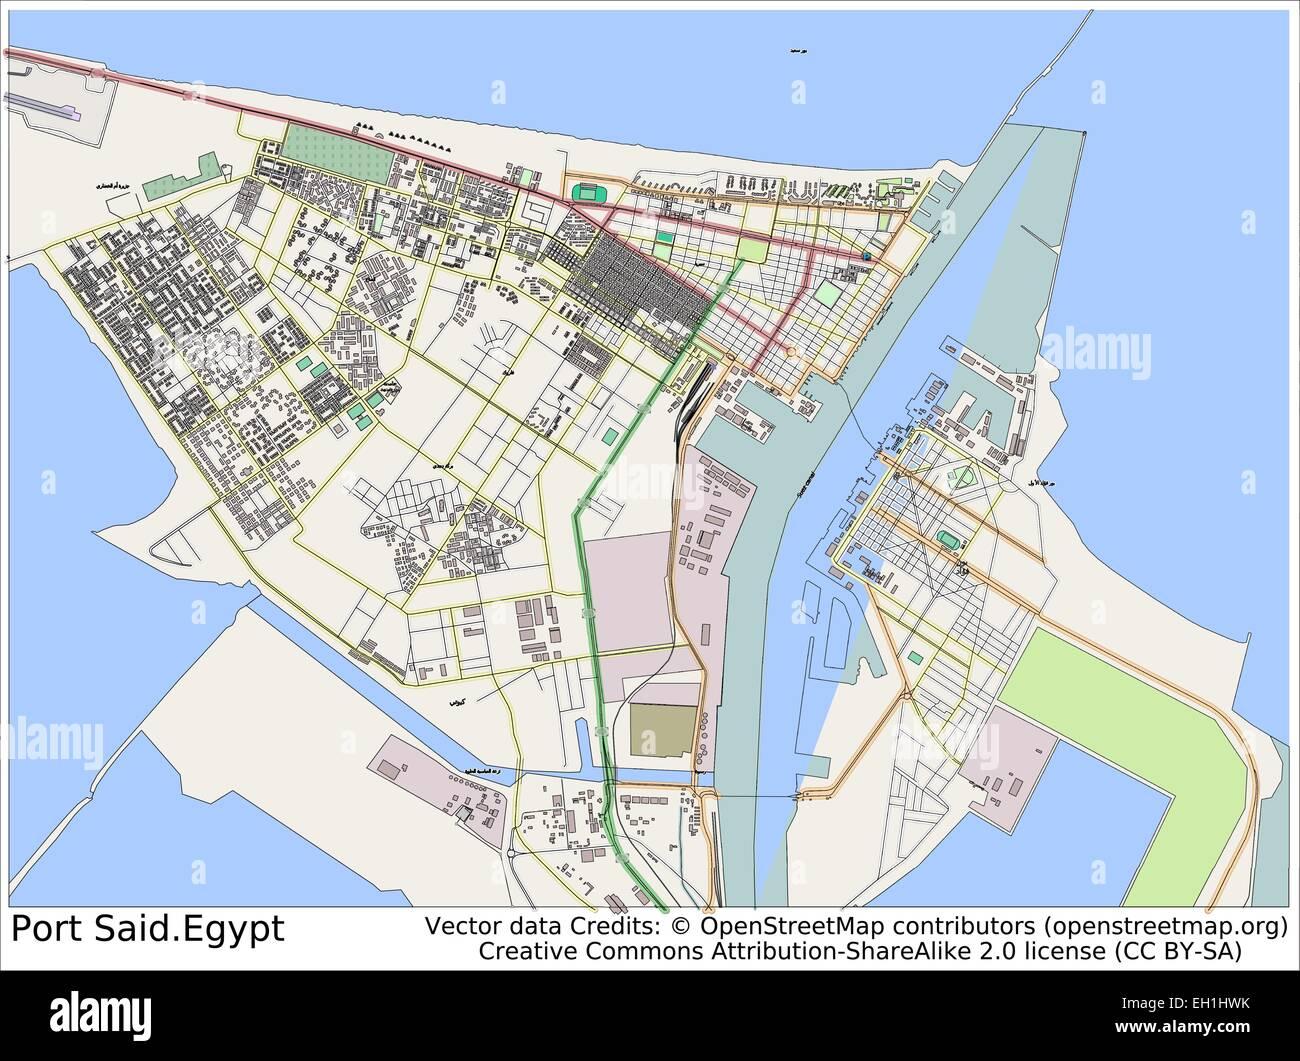 Port said egypt city map stock vector art illustration vector port said egypt city map publicscrutiny Gallery